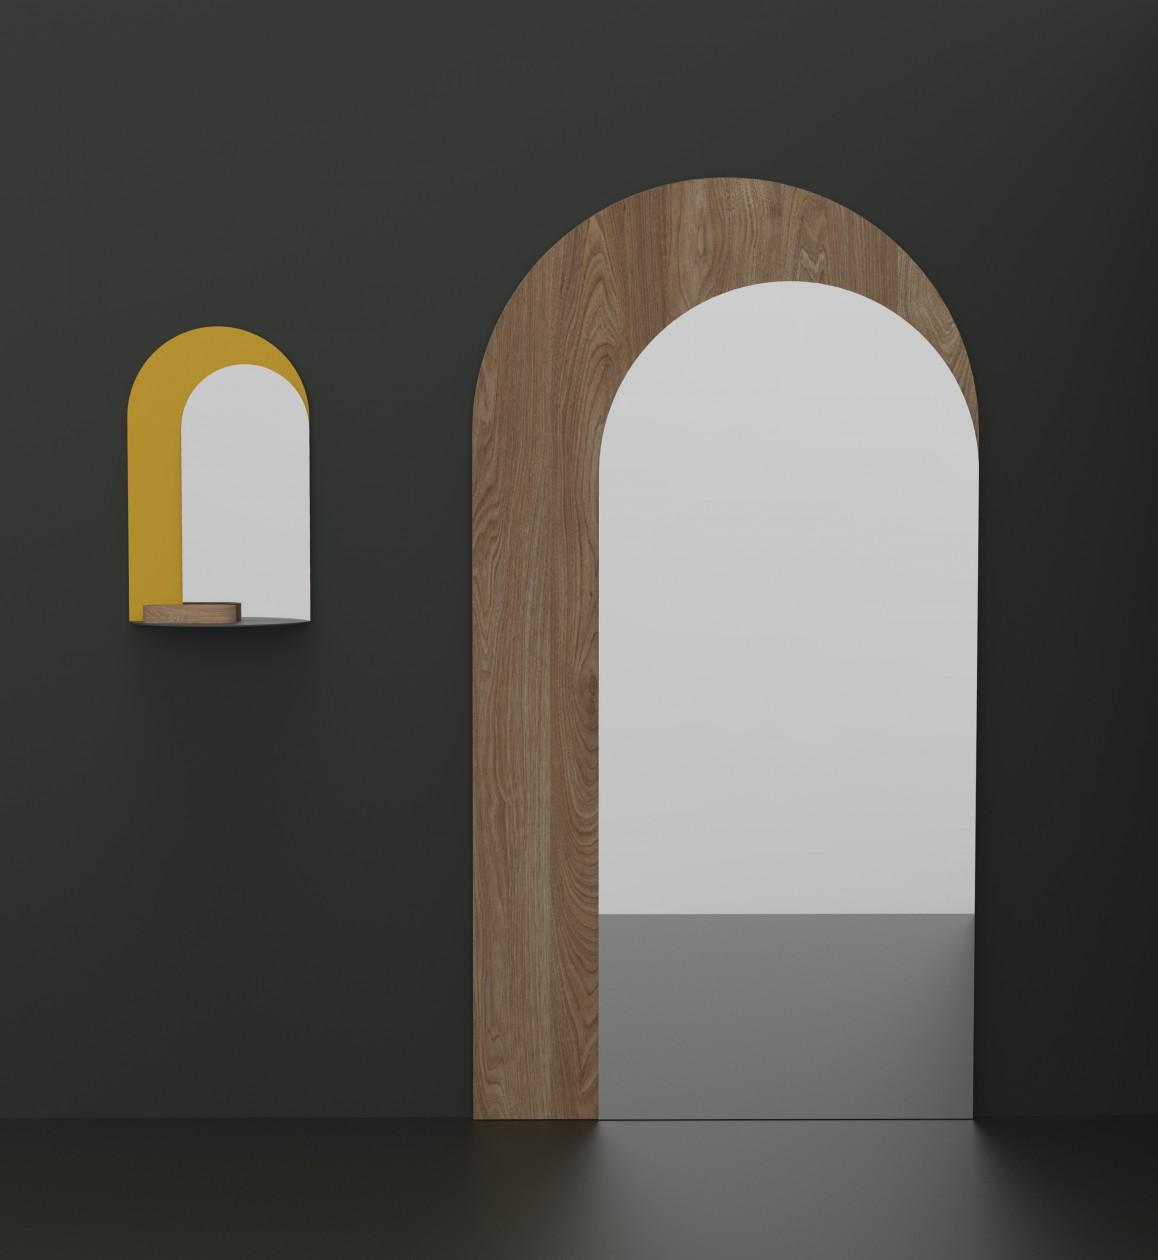 trompe l 39 oeil xxl alain gilles. Black Bedroom Furniture Sets. Home Design Ideas